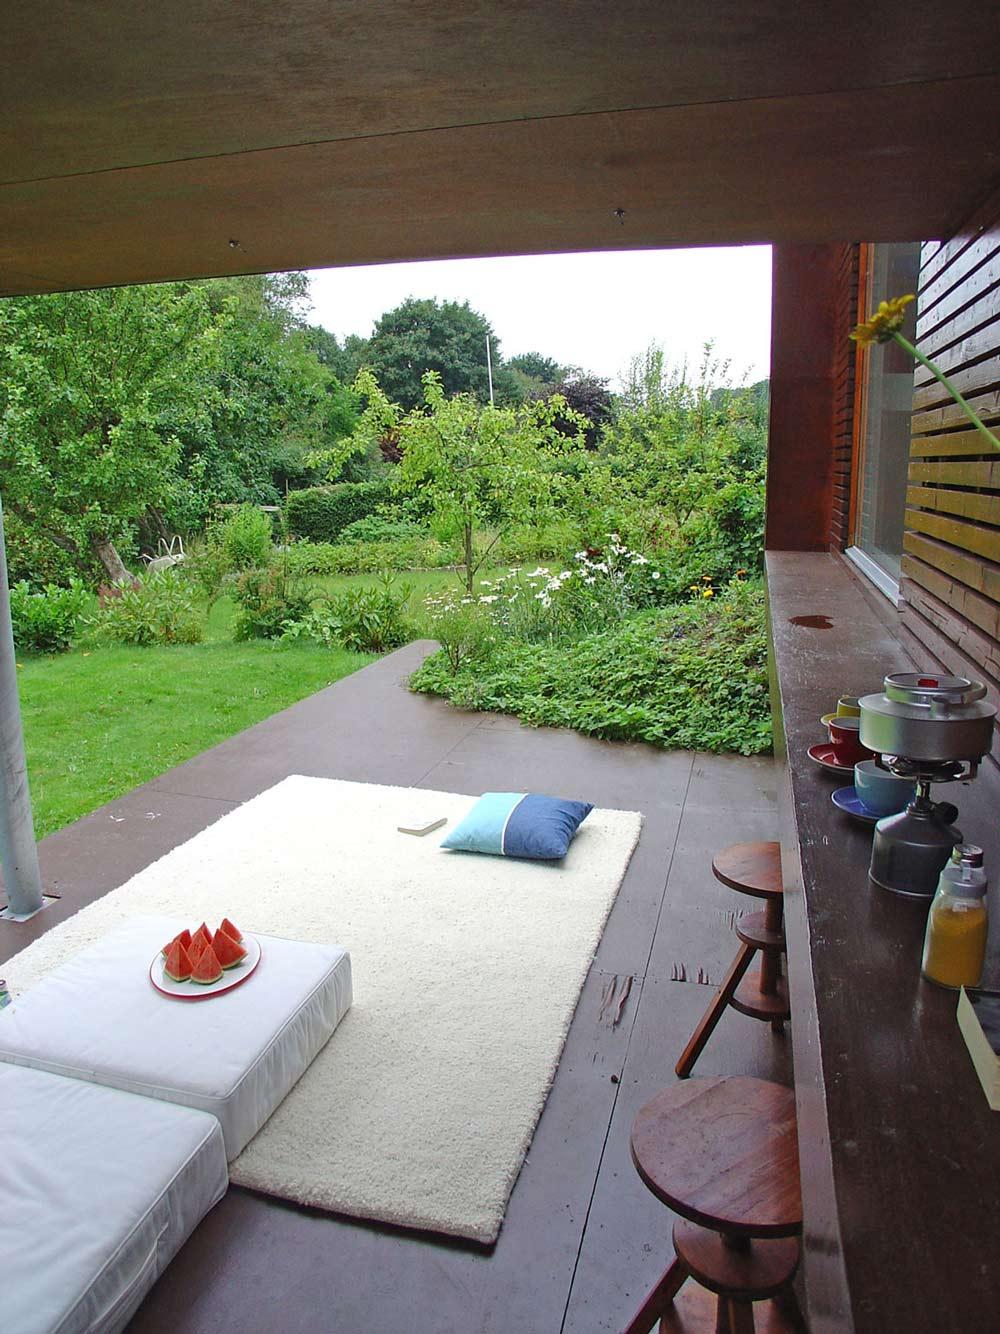 Deck, Rug, Casa Kolonihagen in Stavanger, Norway by Tommie Wilhelmsen